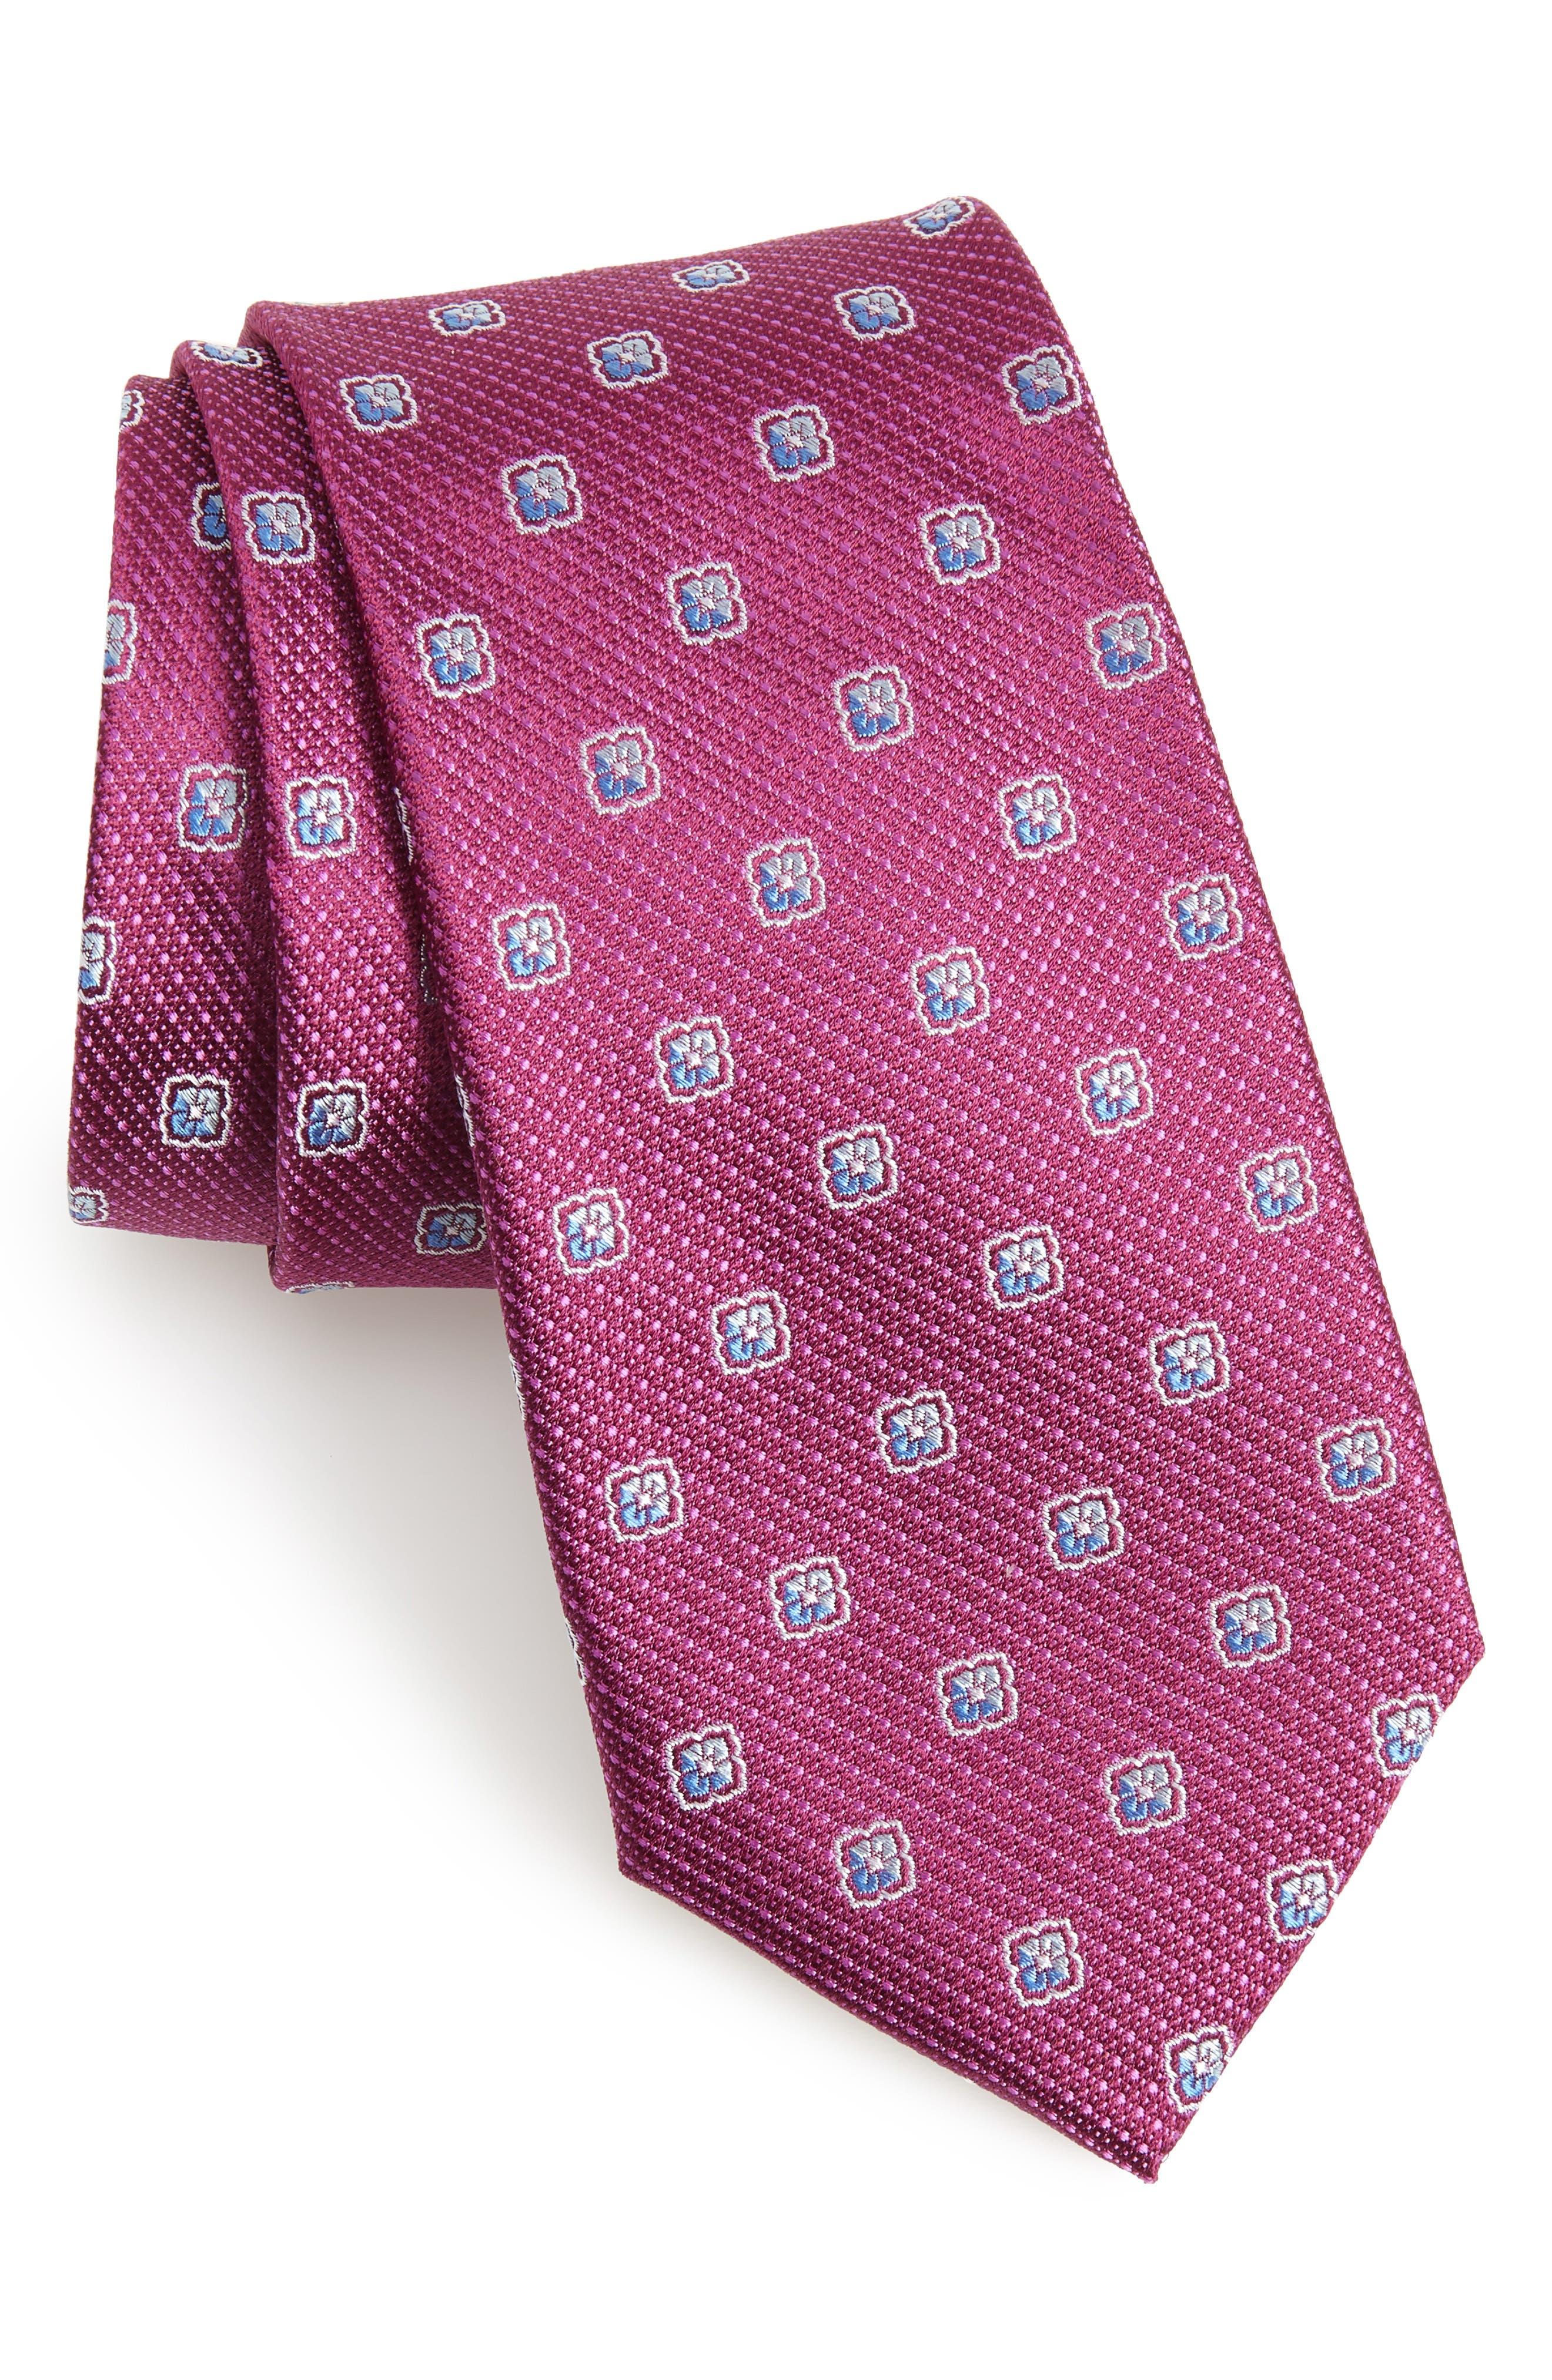 Leary Medallion Silk Tie,                             Main thumbnail 3, color,